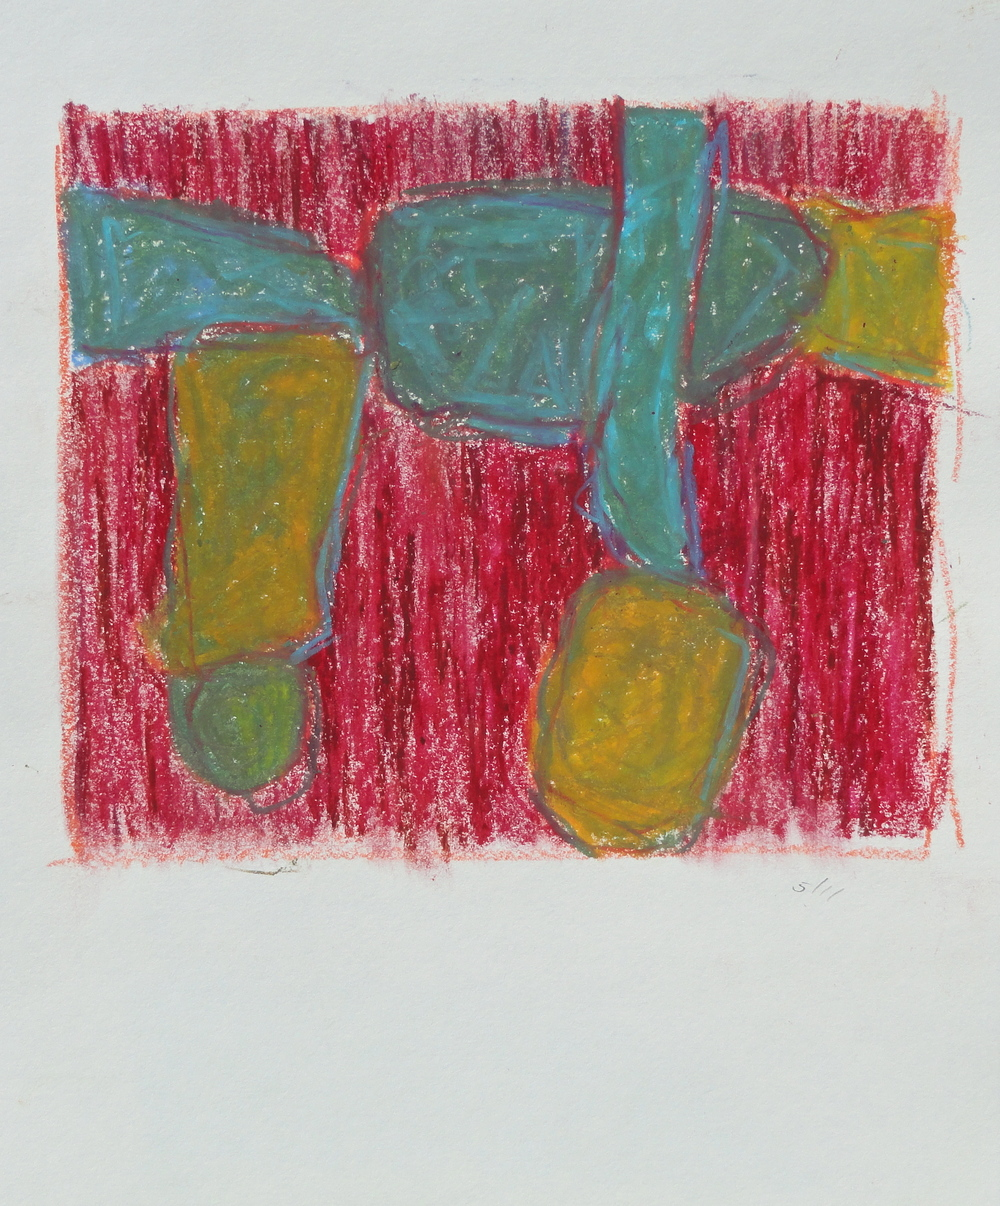 oil pastel 2011 6 1/2 x 7 1/2